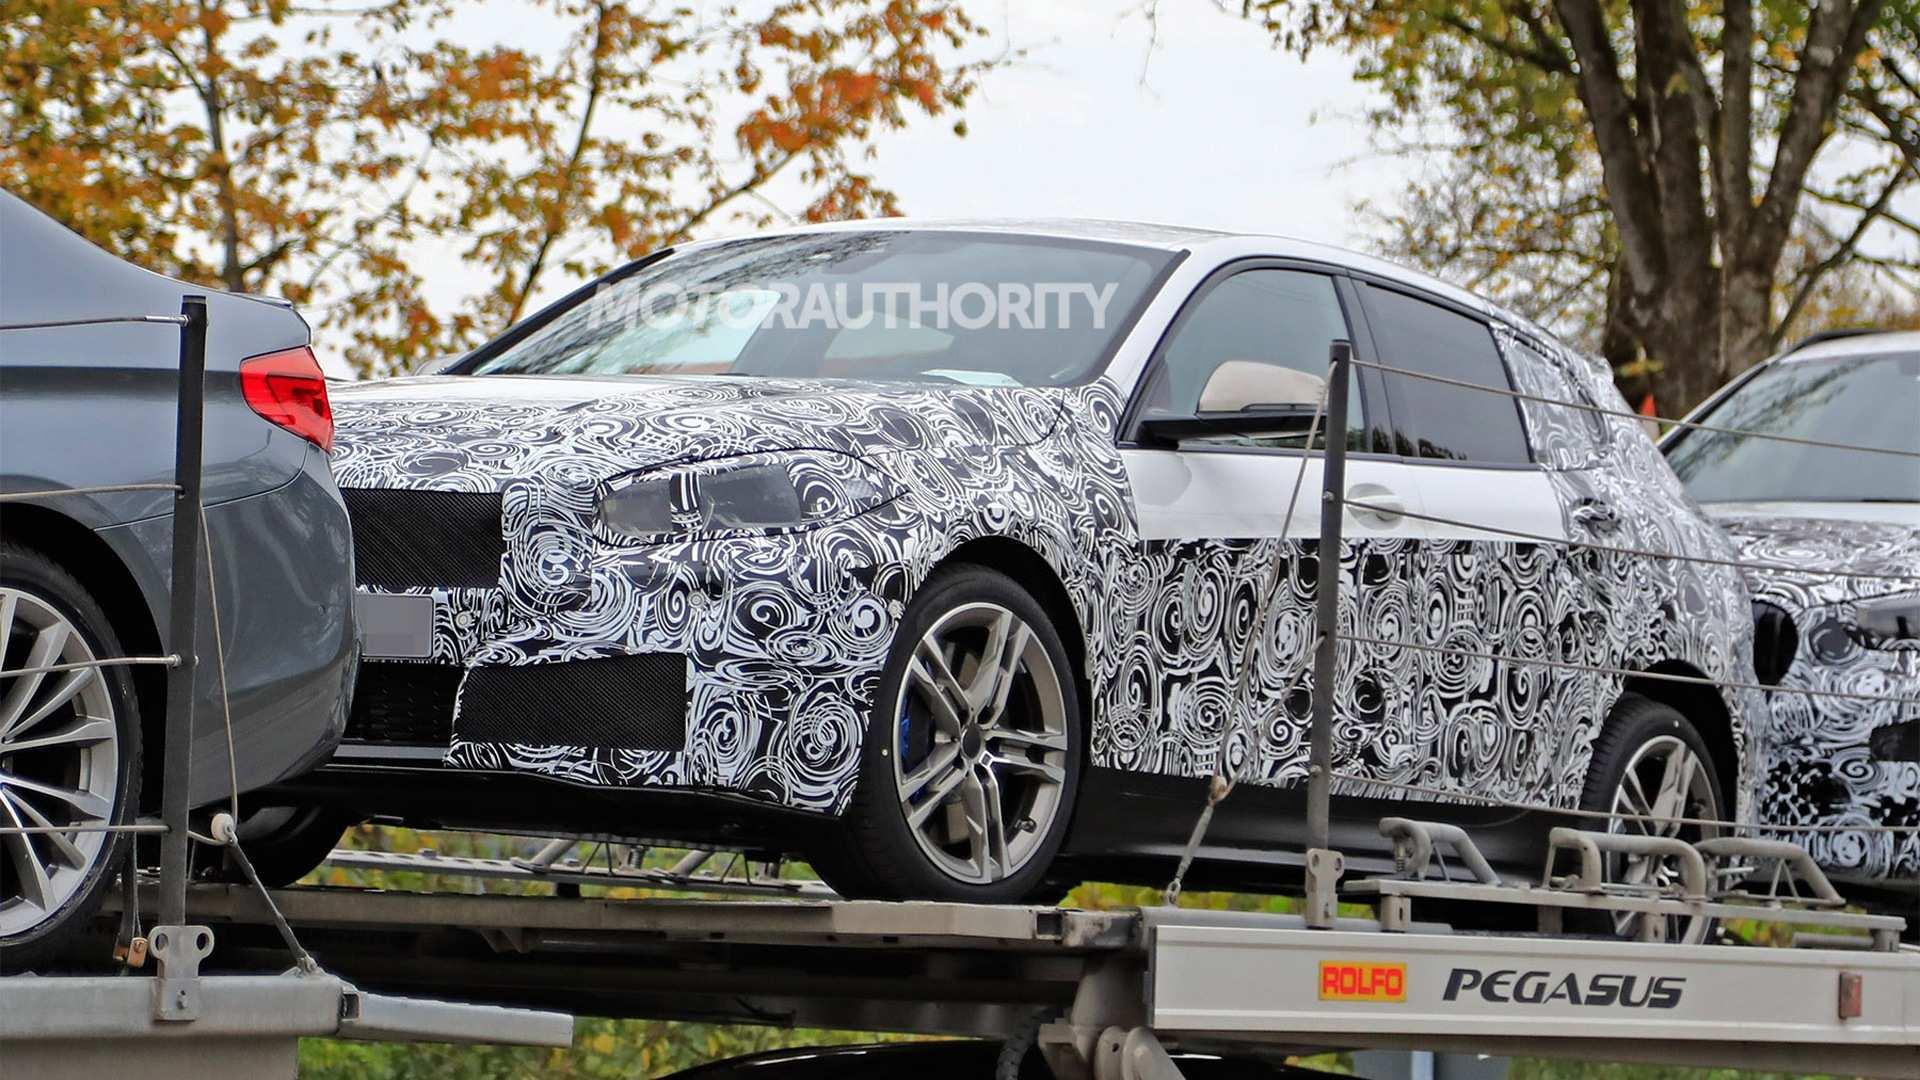 68 New 2019 Bmw Hatchback Spy Shoot by 2019 Bmw Hatchback